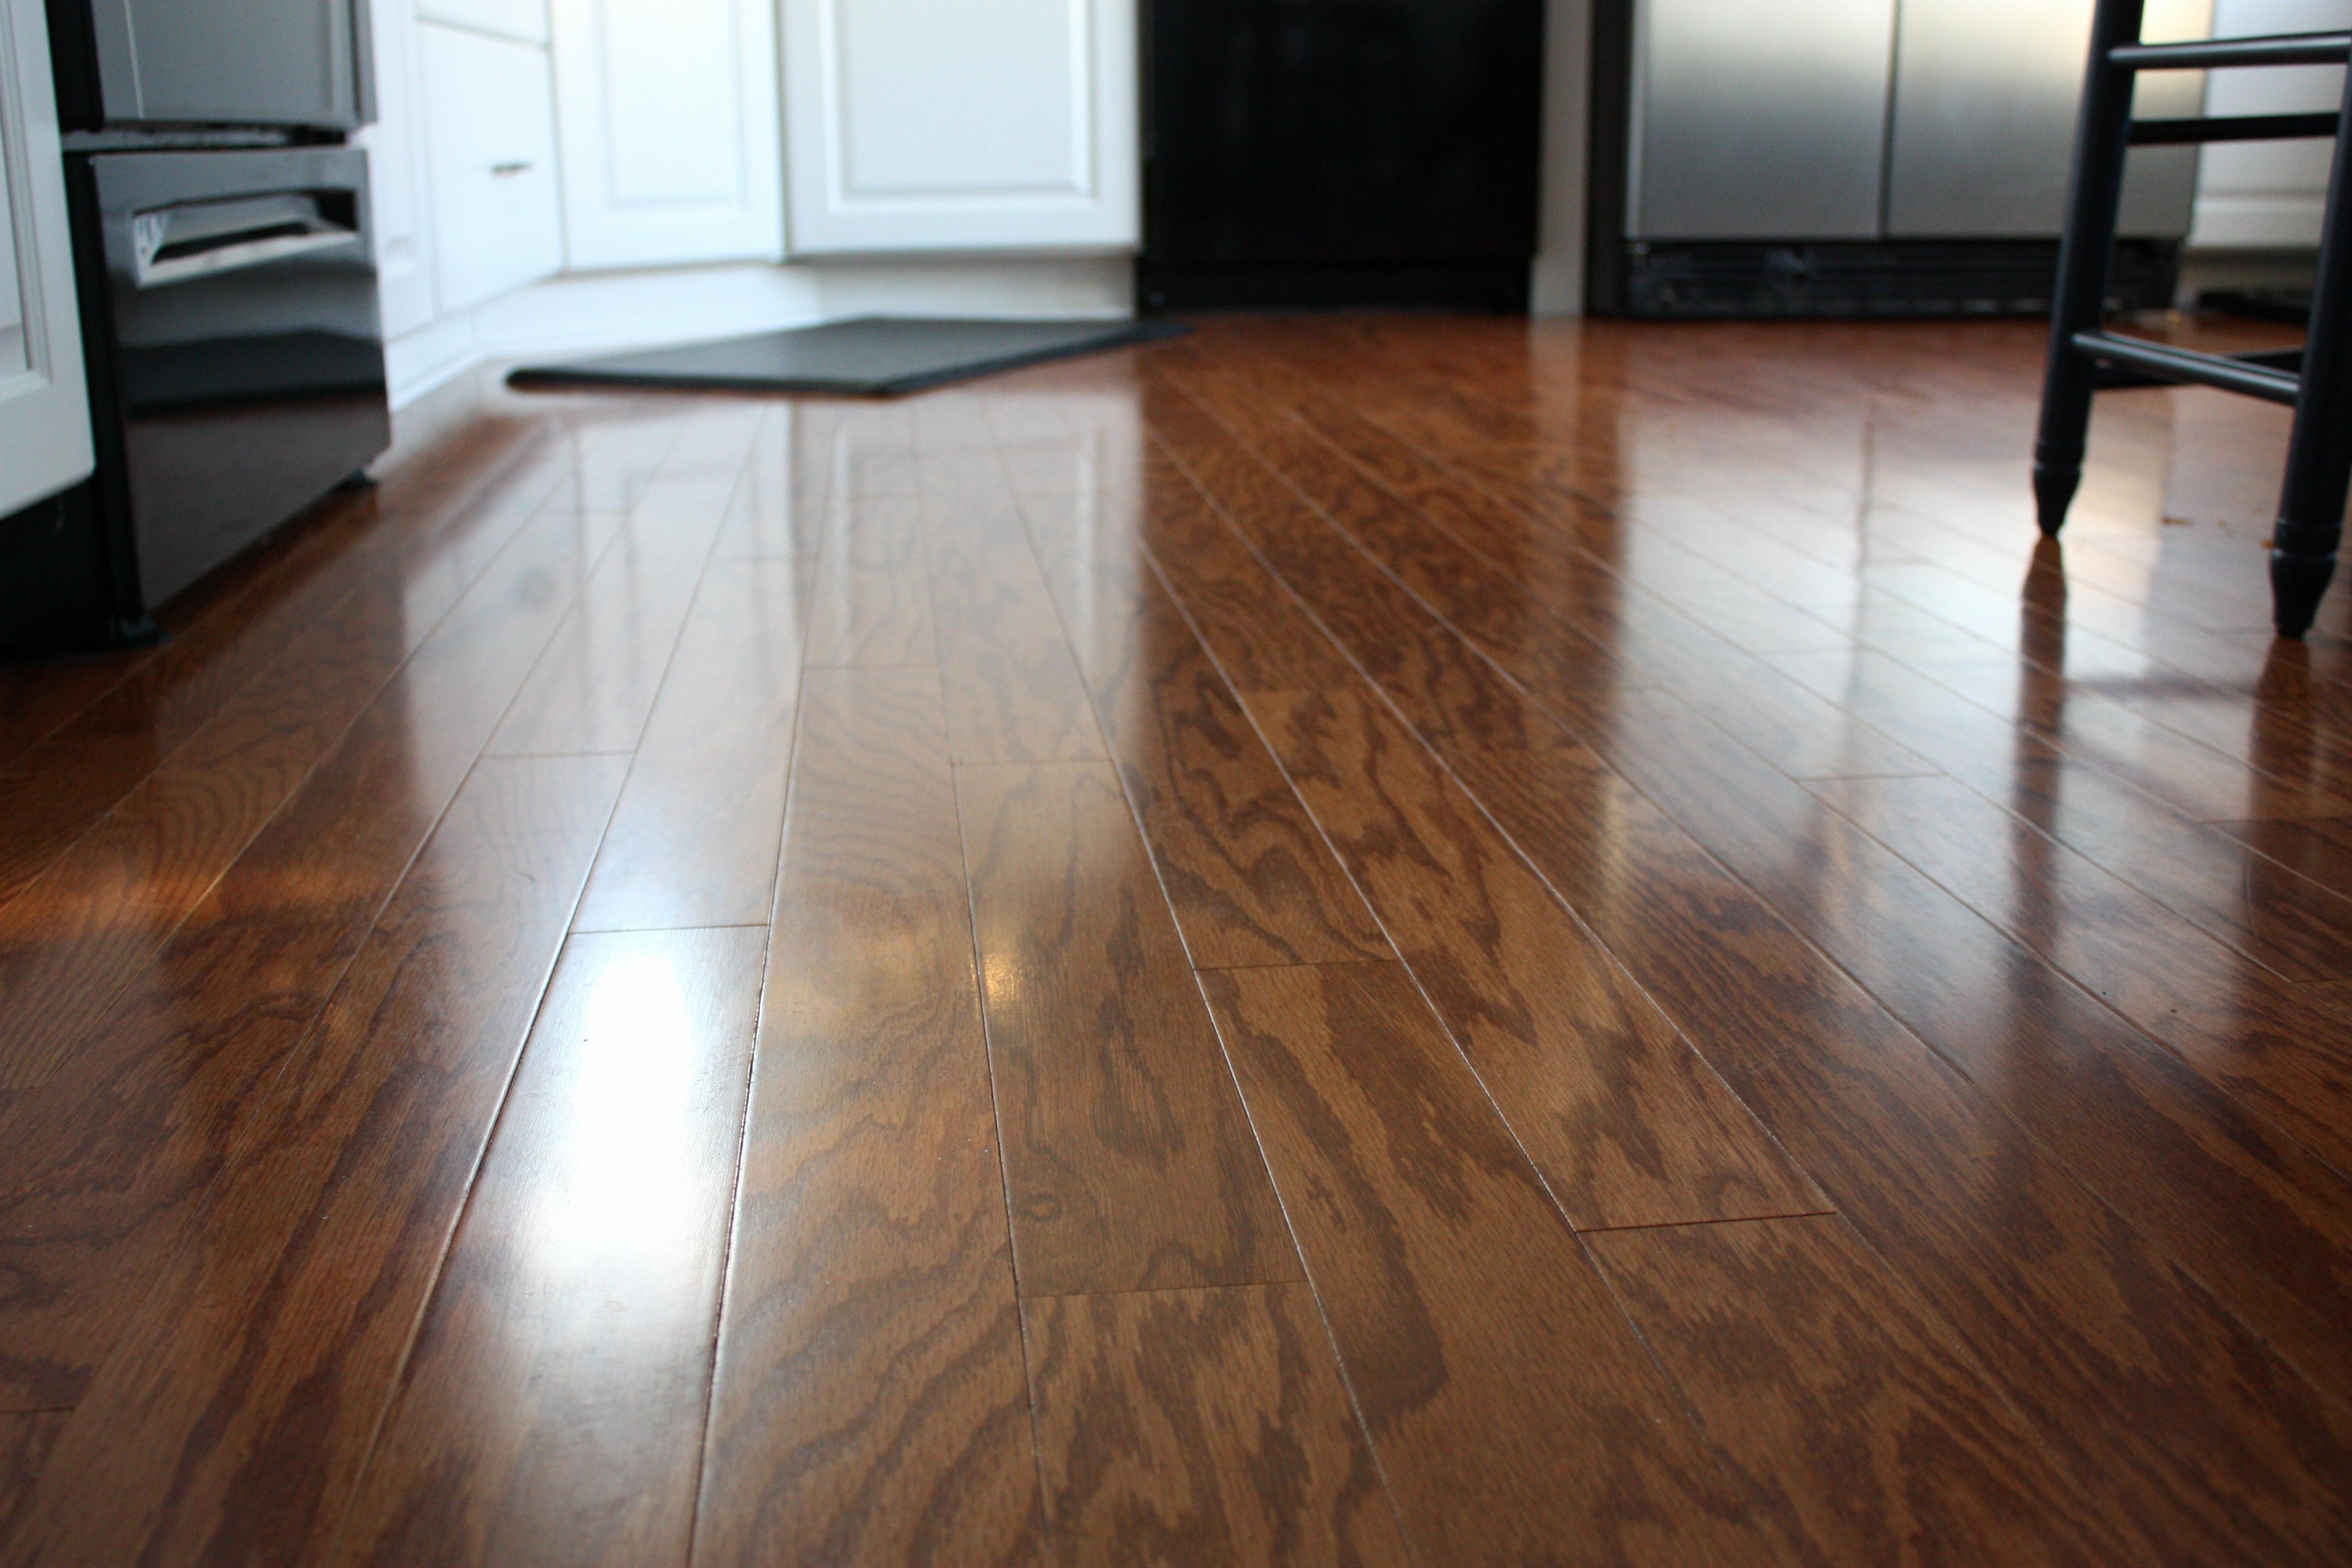 6 Engineered Hardwood Flooring Of the Wood Maker Page 6 Wood Wallpaper Intended for Floor Floorod Cleaning Hardwood Carpet Lake forest Il Rare Image Ideas Of Wood Floor Steam Cleaner